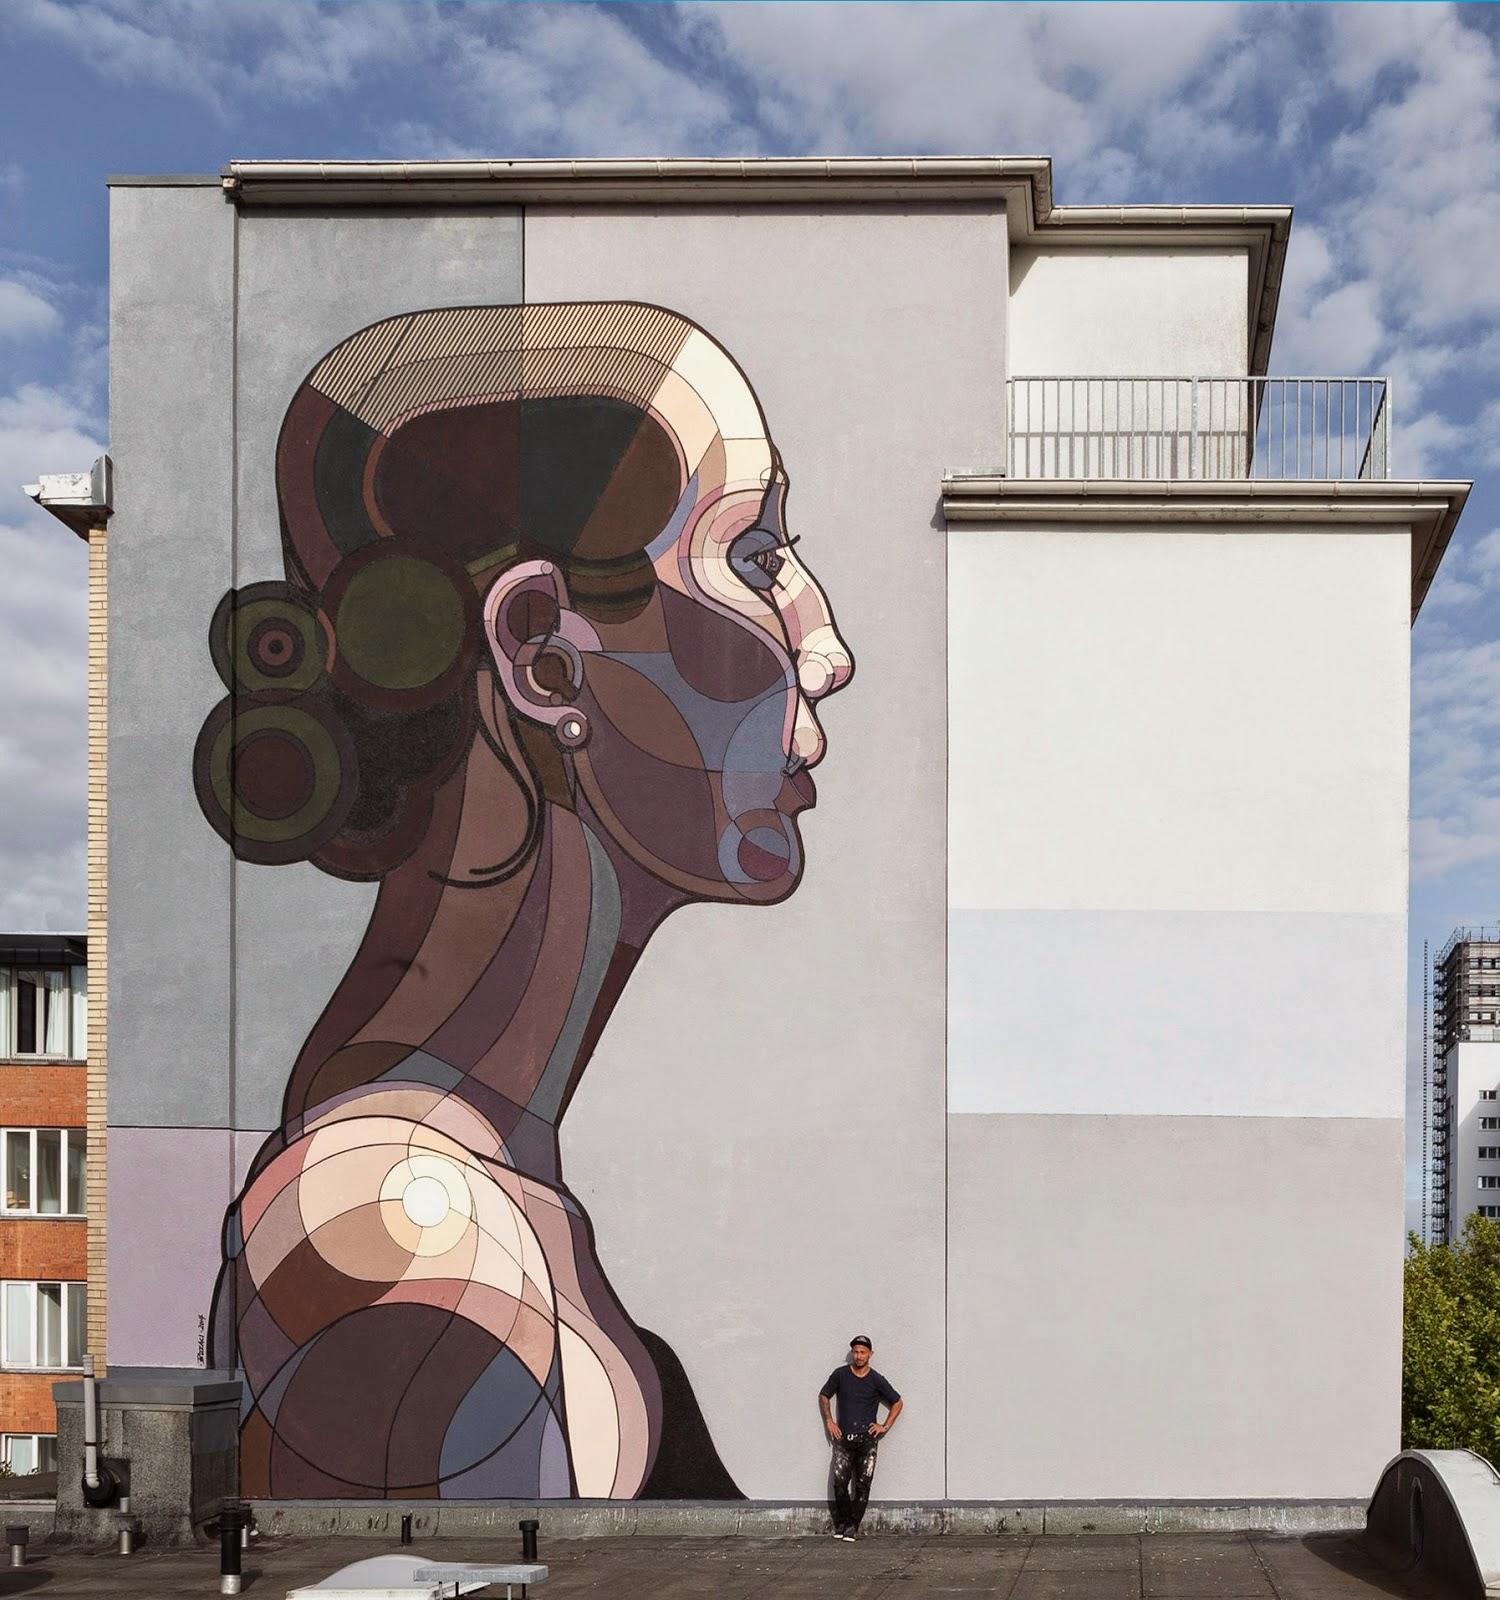 Ata Bozaci Paints Beautiful Facebook For Stamp Festival Hamburg Germany Streetartnews Streetartnews